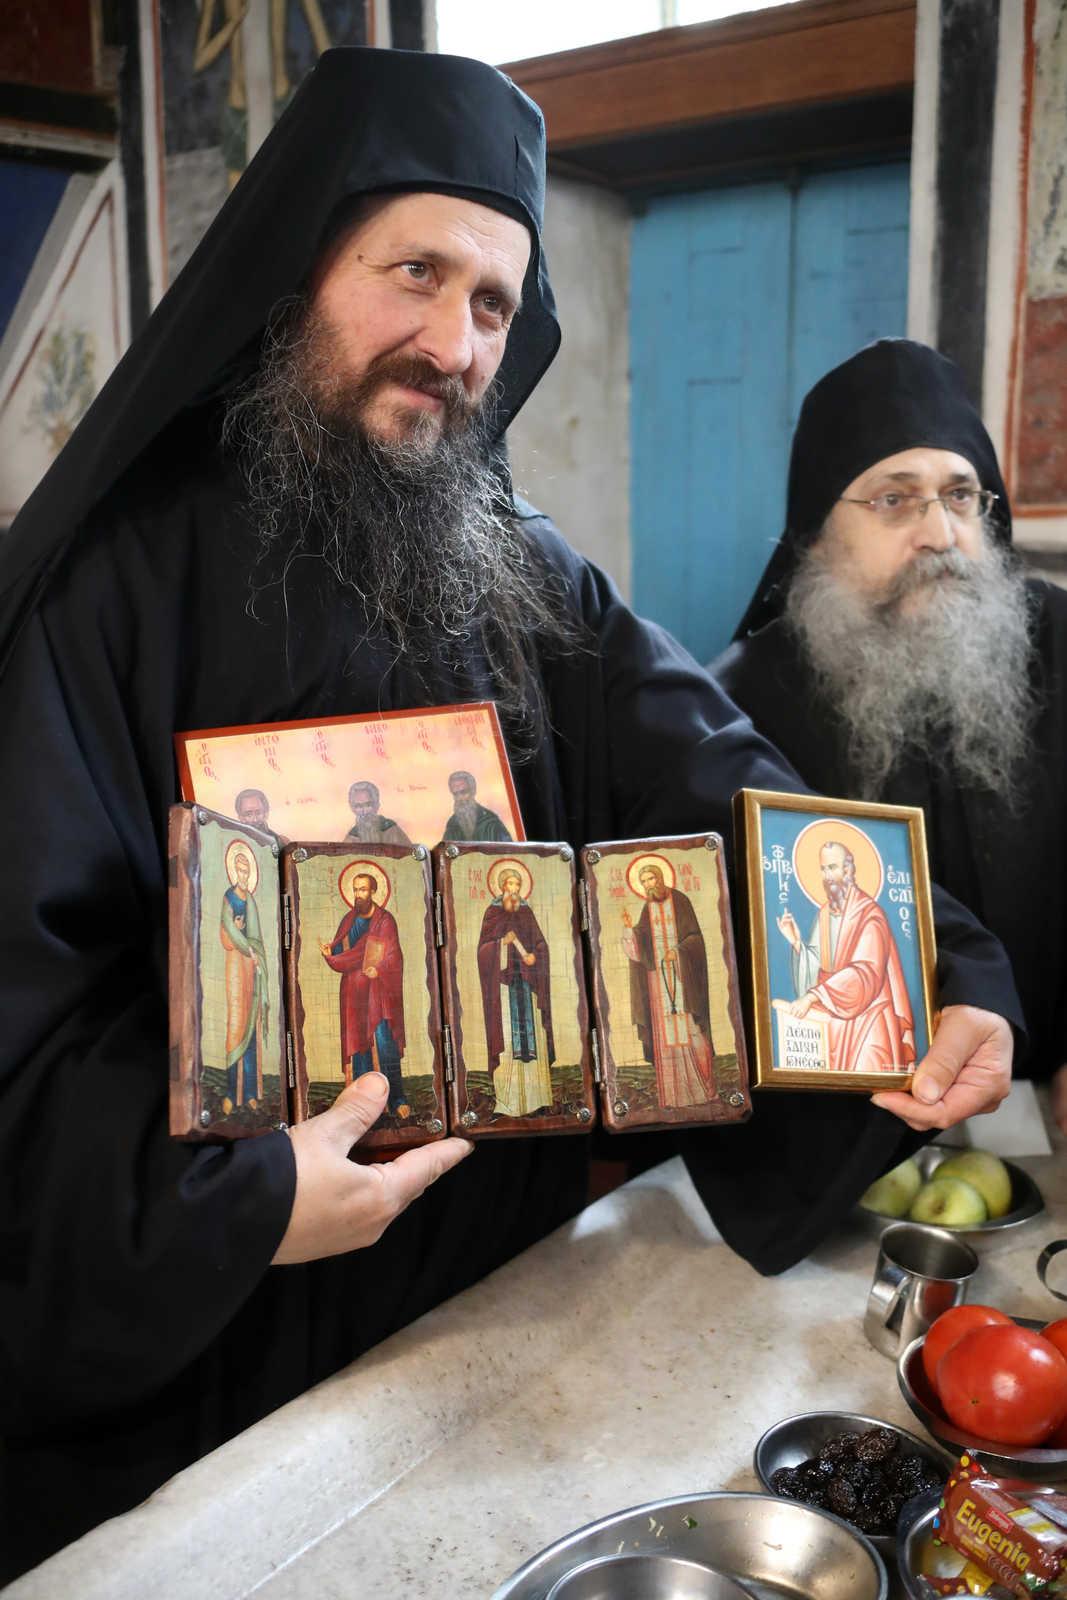 Duminica ortodoxiei: scurt istoric - (c) Mănăstirea Vatoped. Muntele Athos